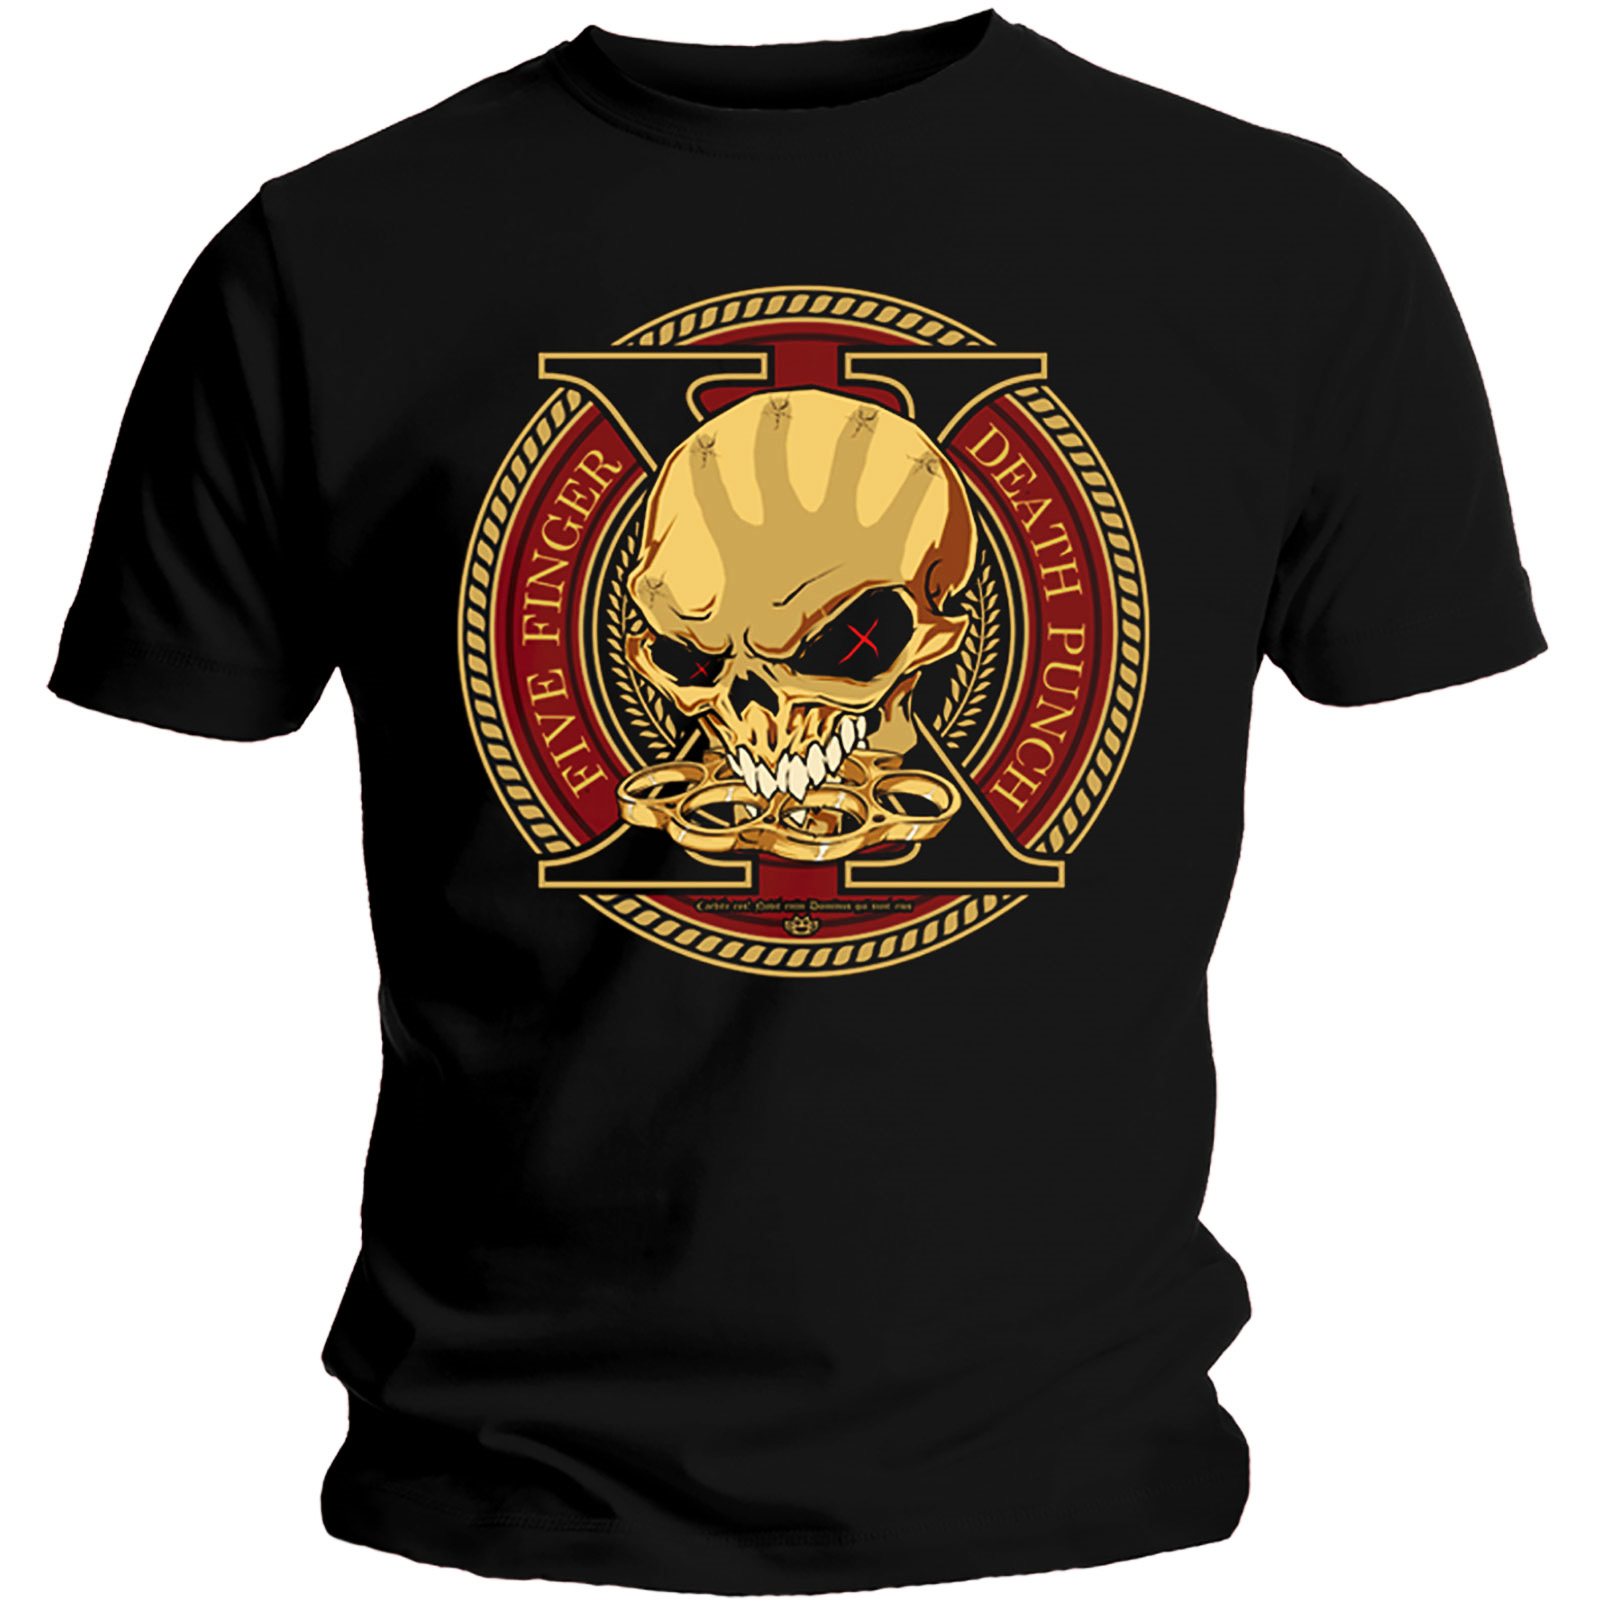 Official-T-Shirt-Five-Finger-Death-Punch-Album-DECADE-of-Destruction-All-Sizes thumbnail 9